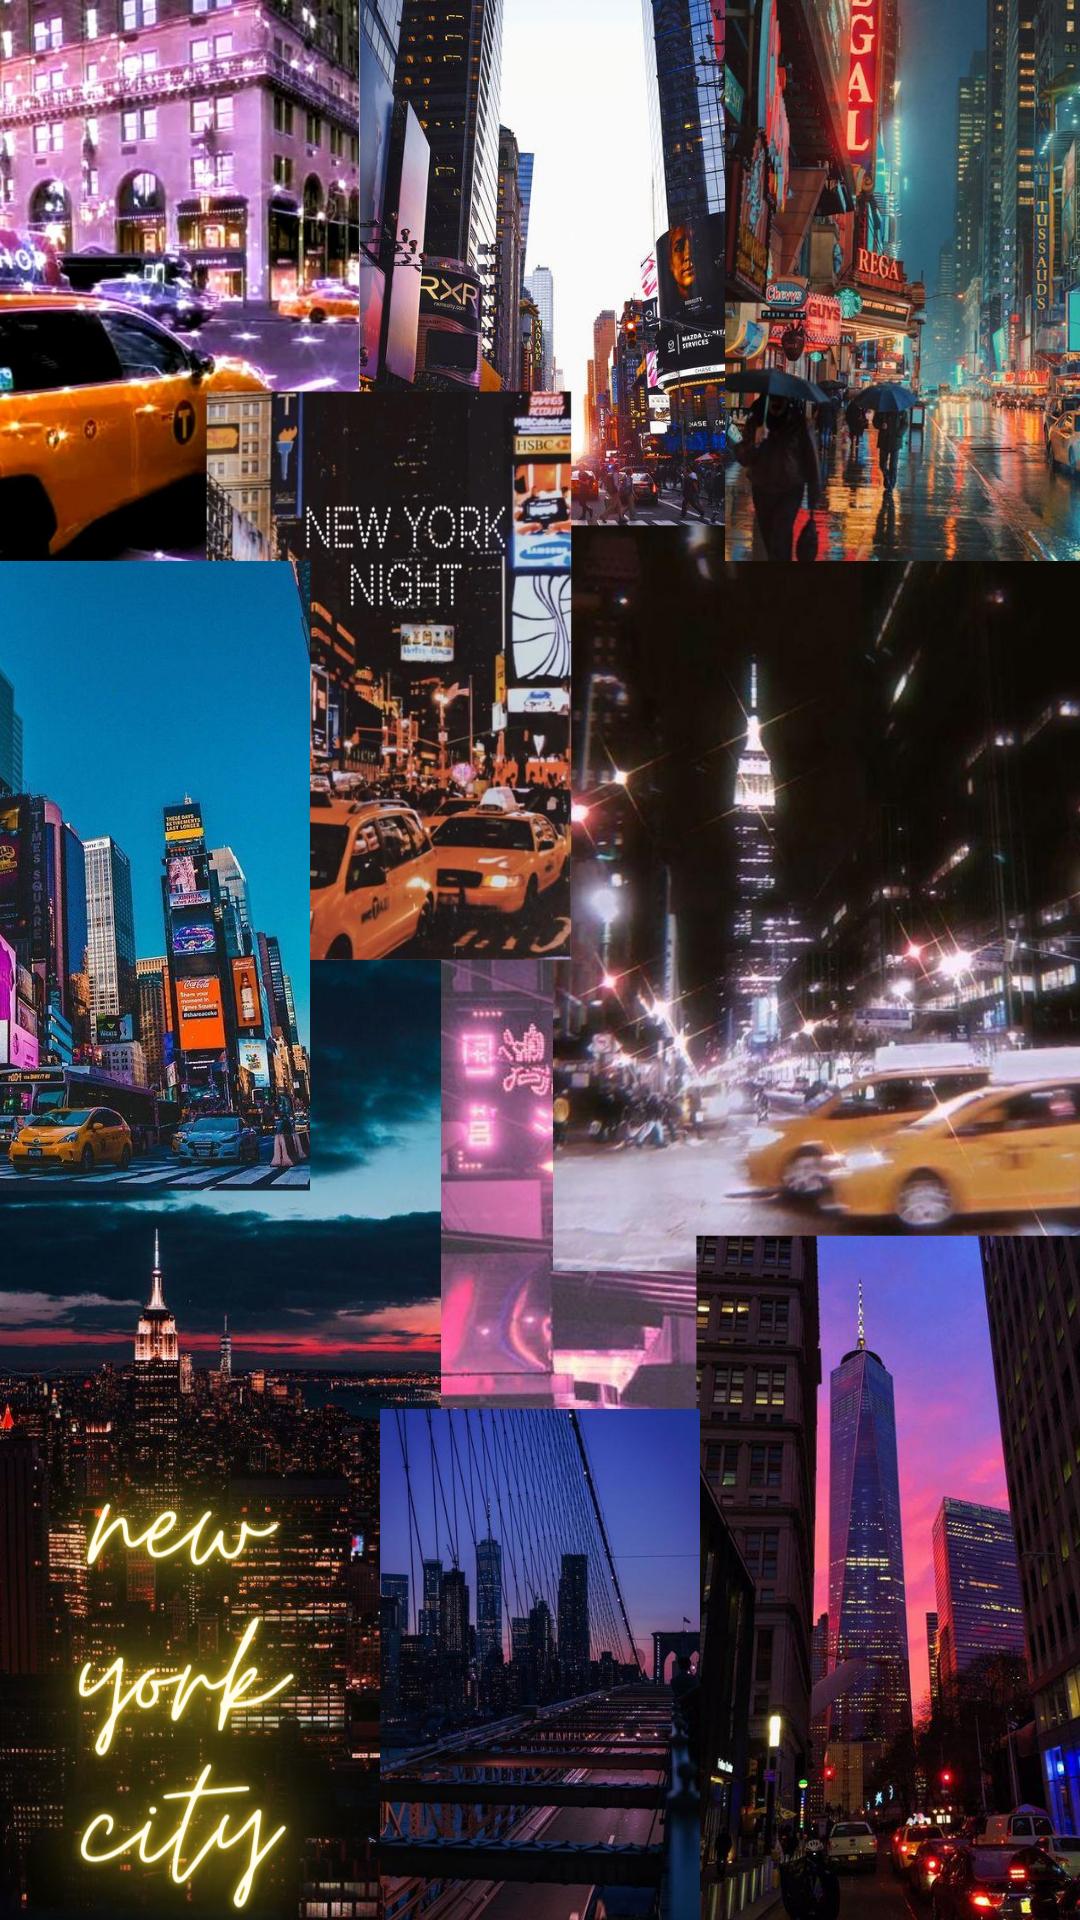 New York City Aesthetic New York Poster New York Wallpaper New York Pictures